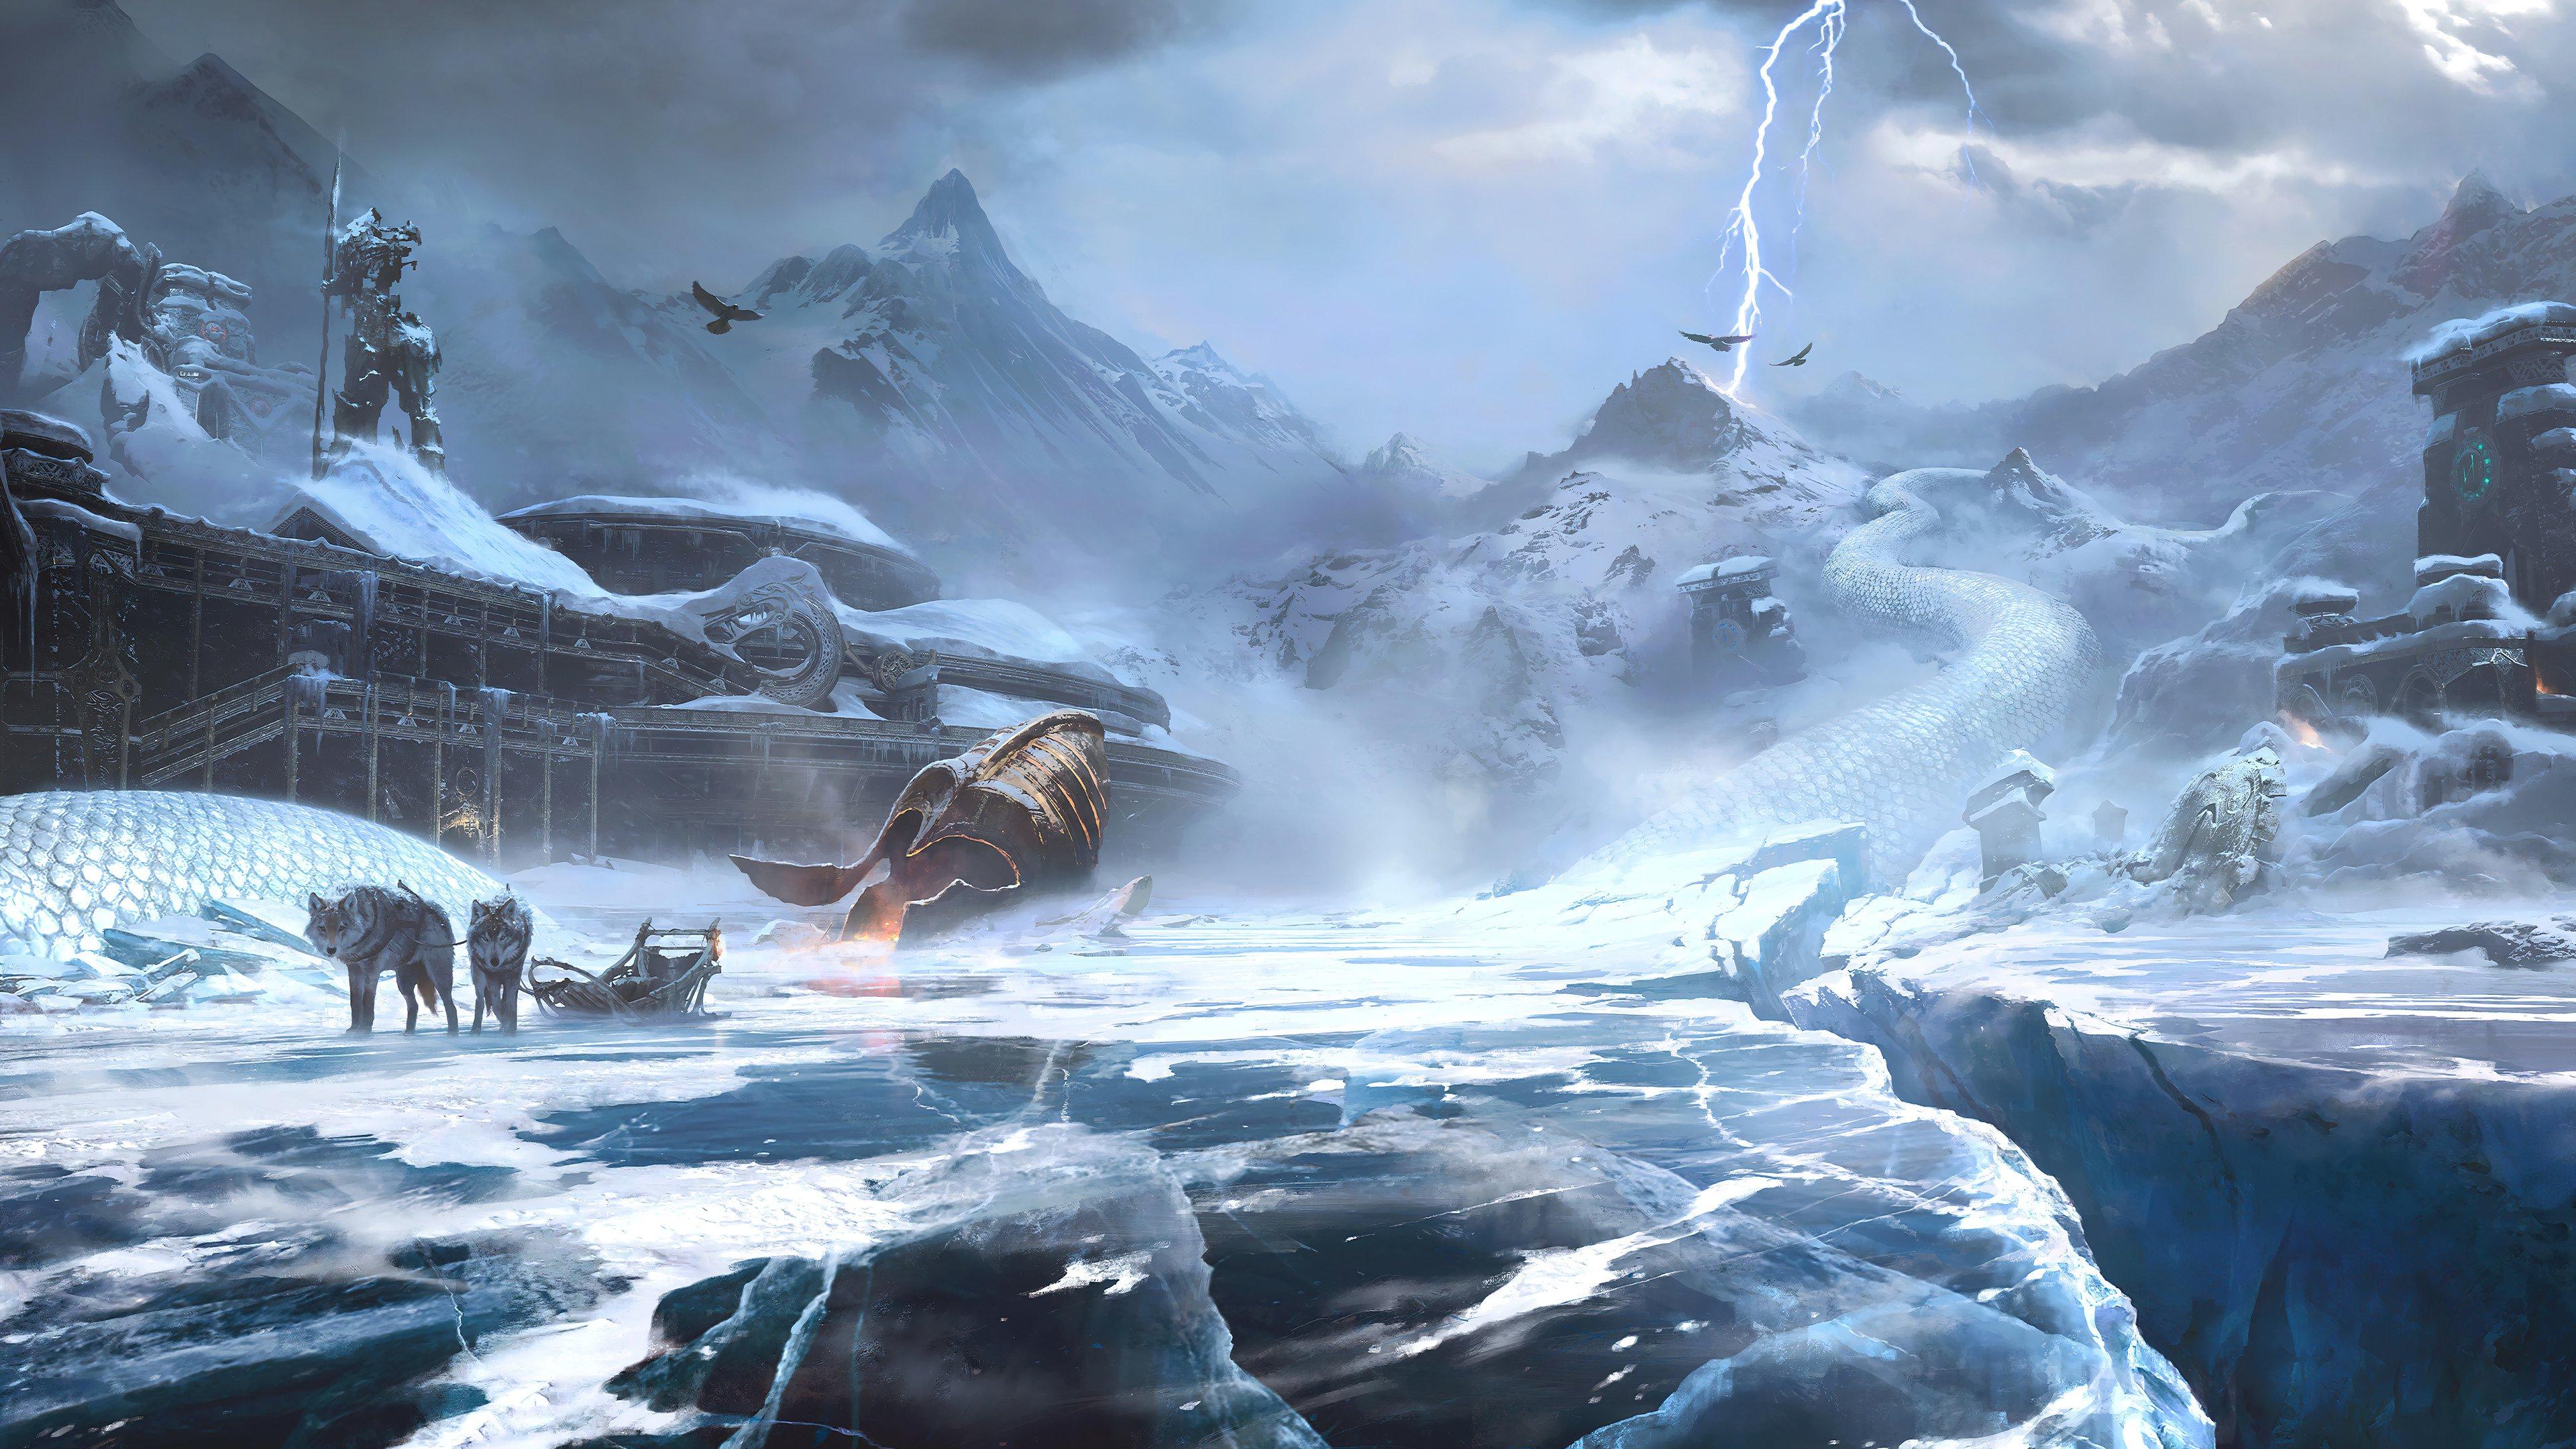 Fondos de pantalla Paisaje de God of War Ragnarok